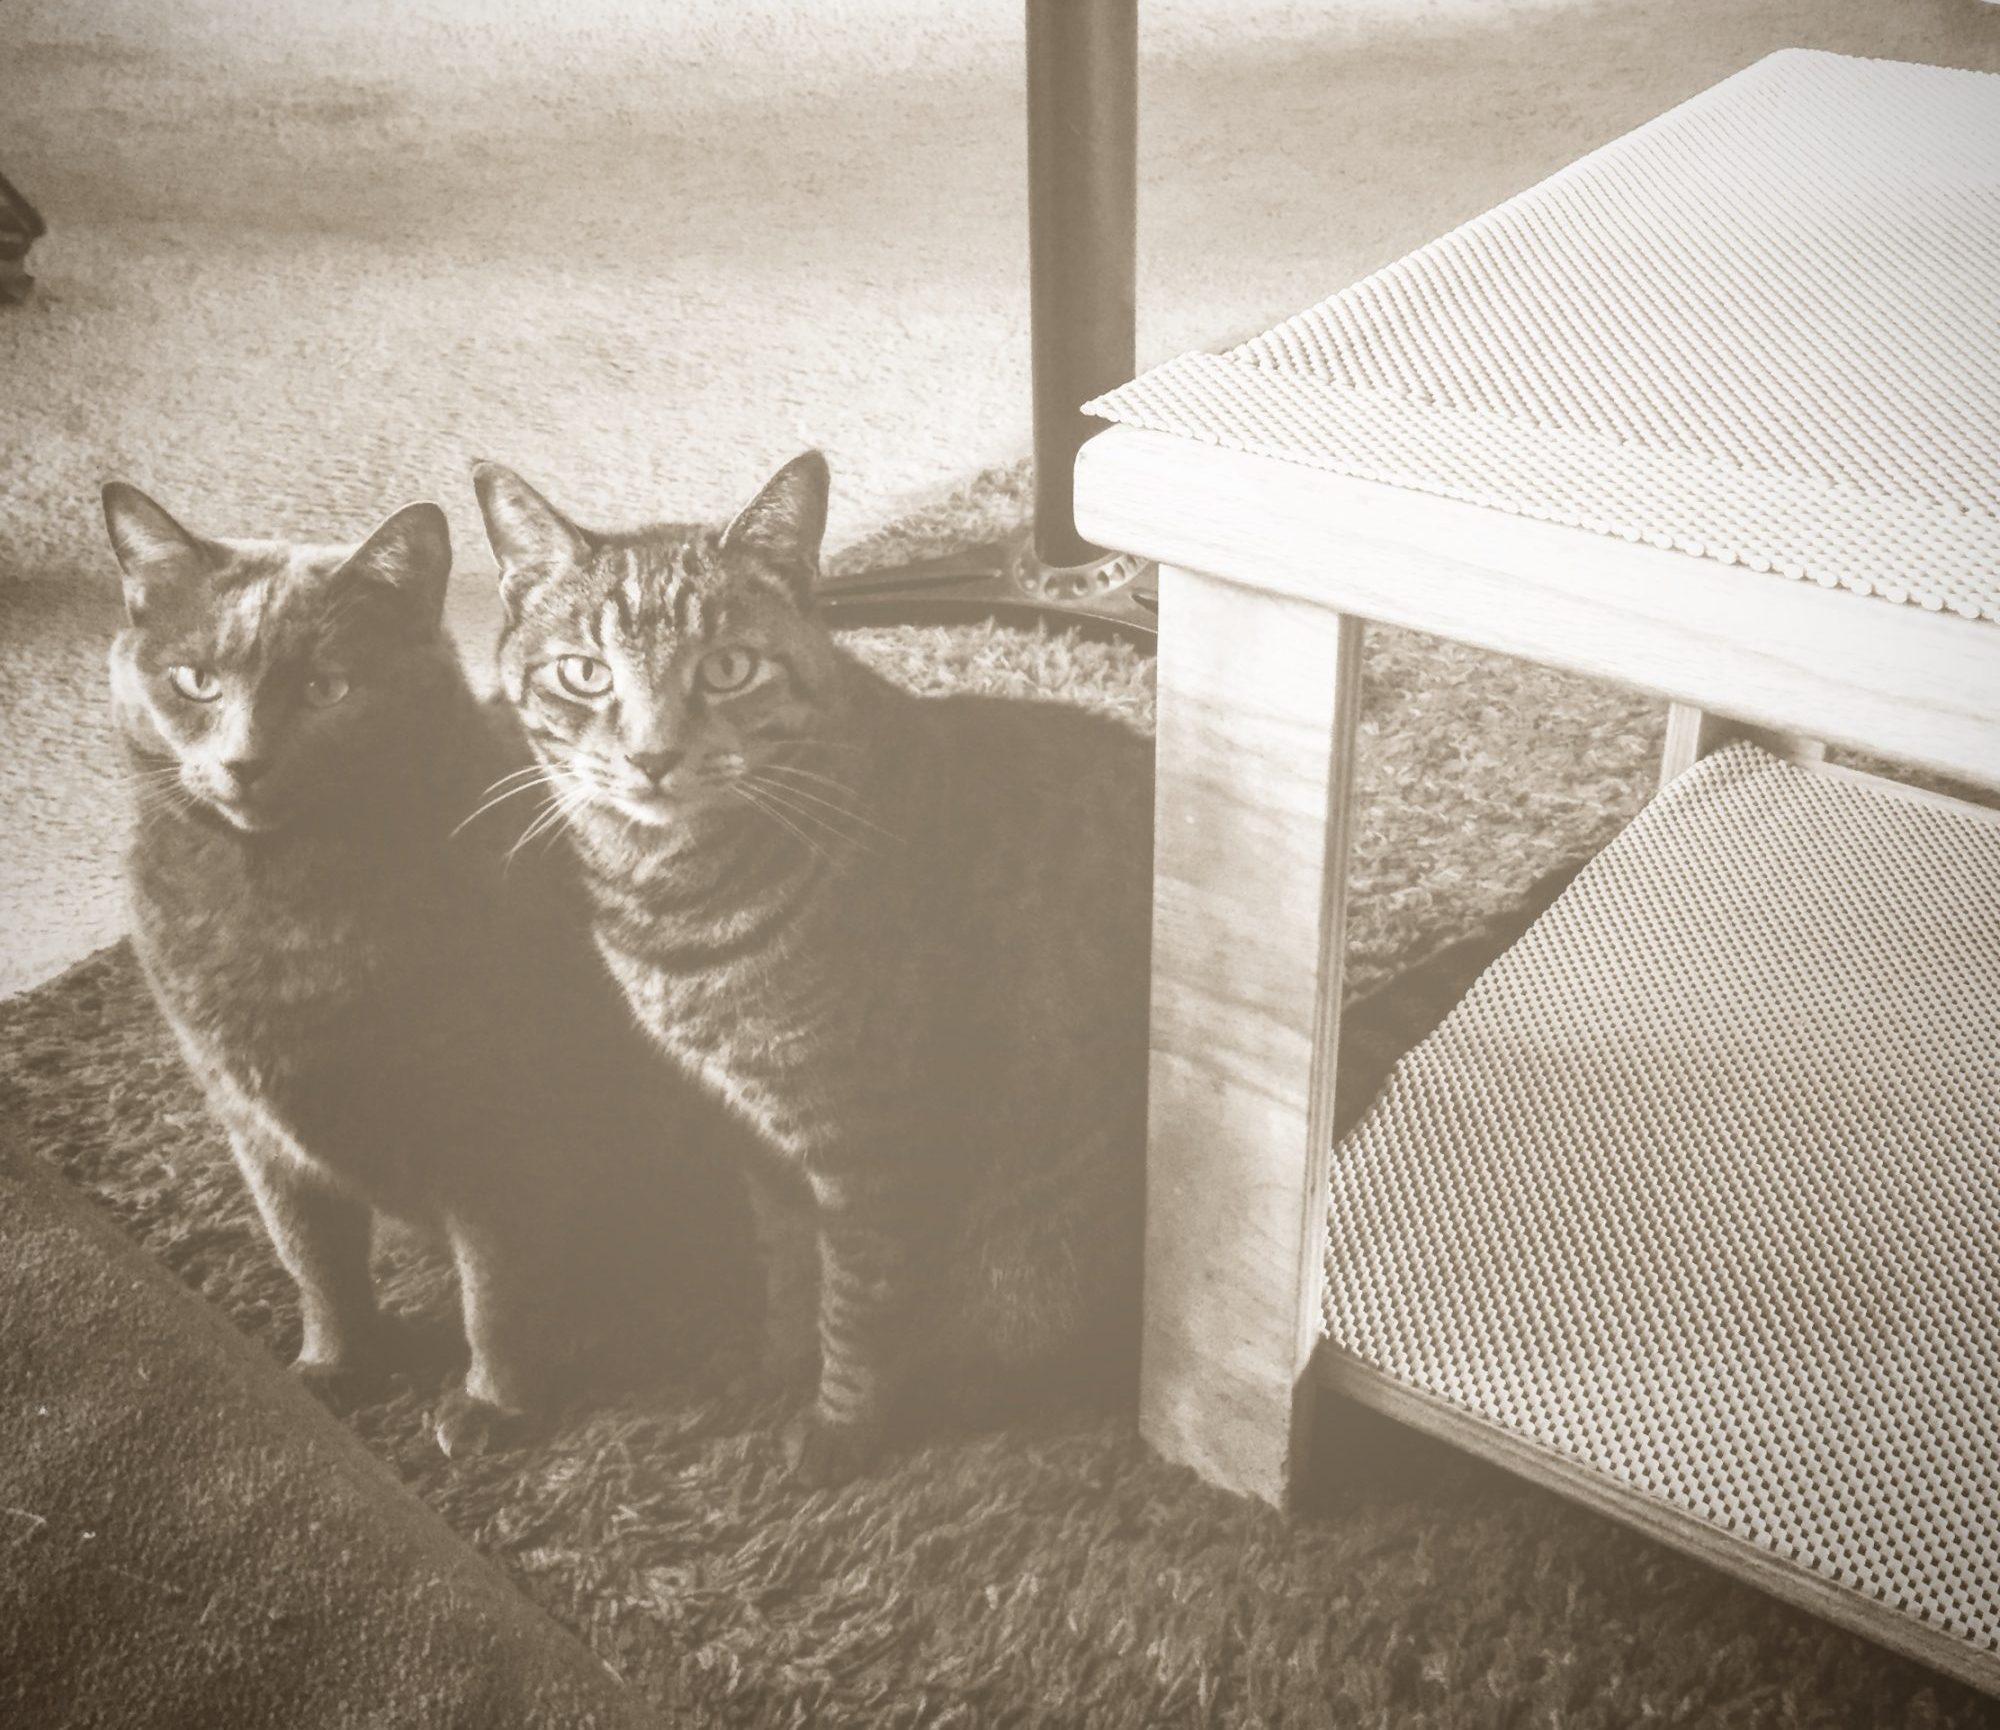 Cats Of TwoCat Studios In Tucson Arizona